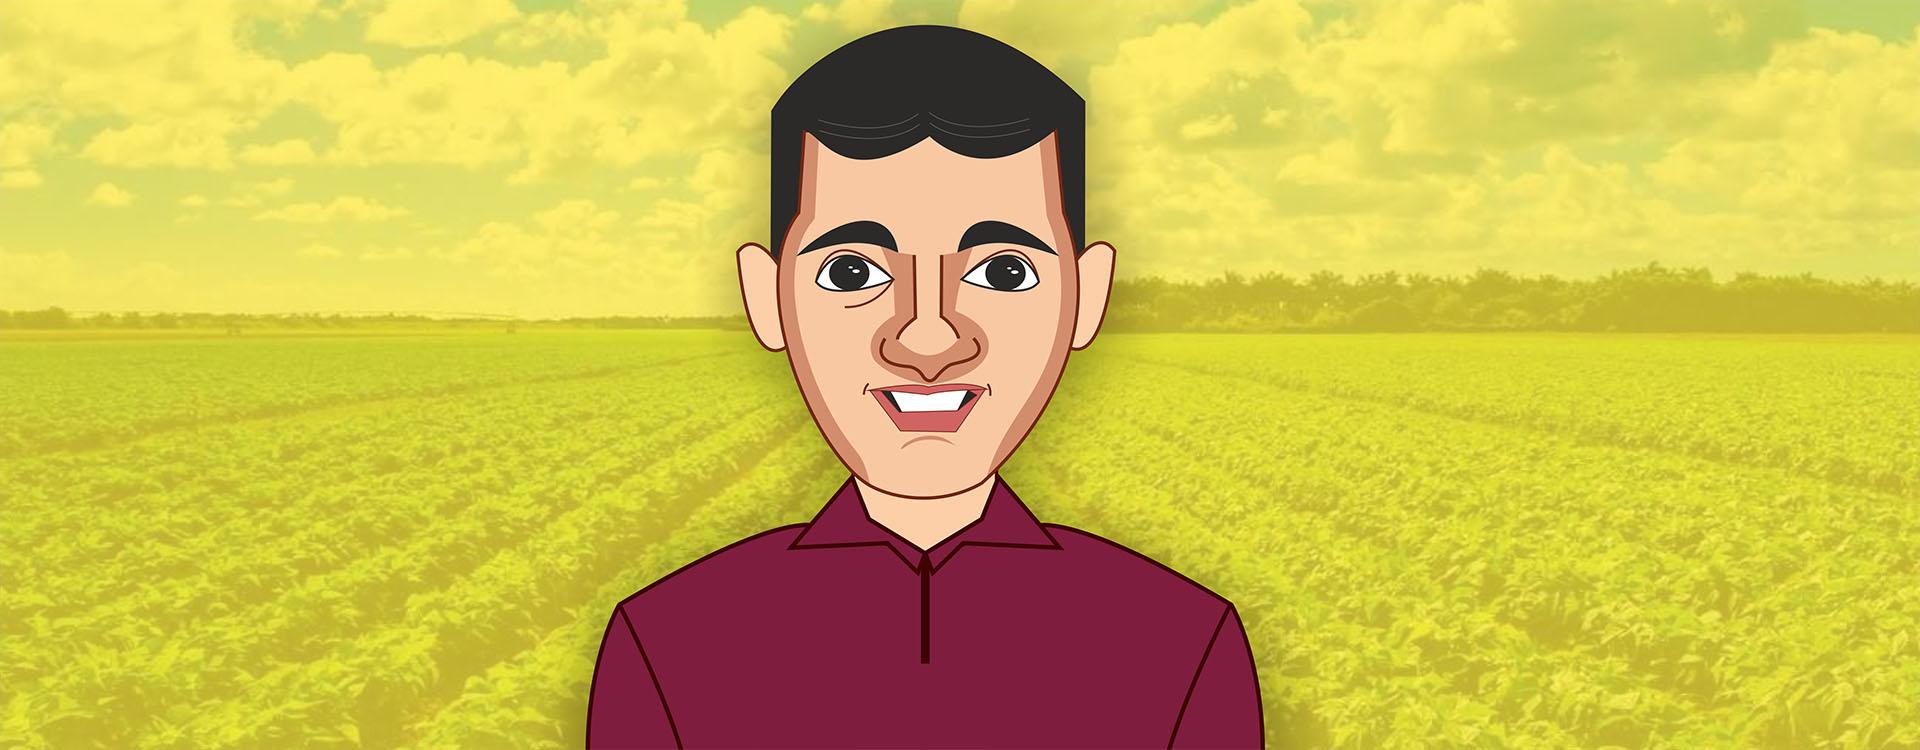 Sid's Farm Cultivating Humanity: Kishore Kumar's Tale of Success